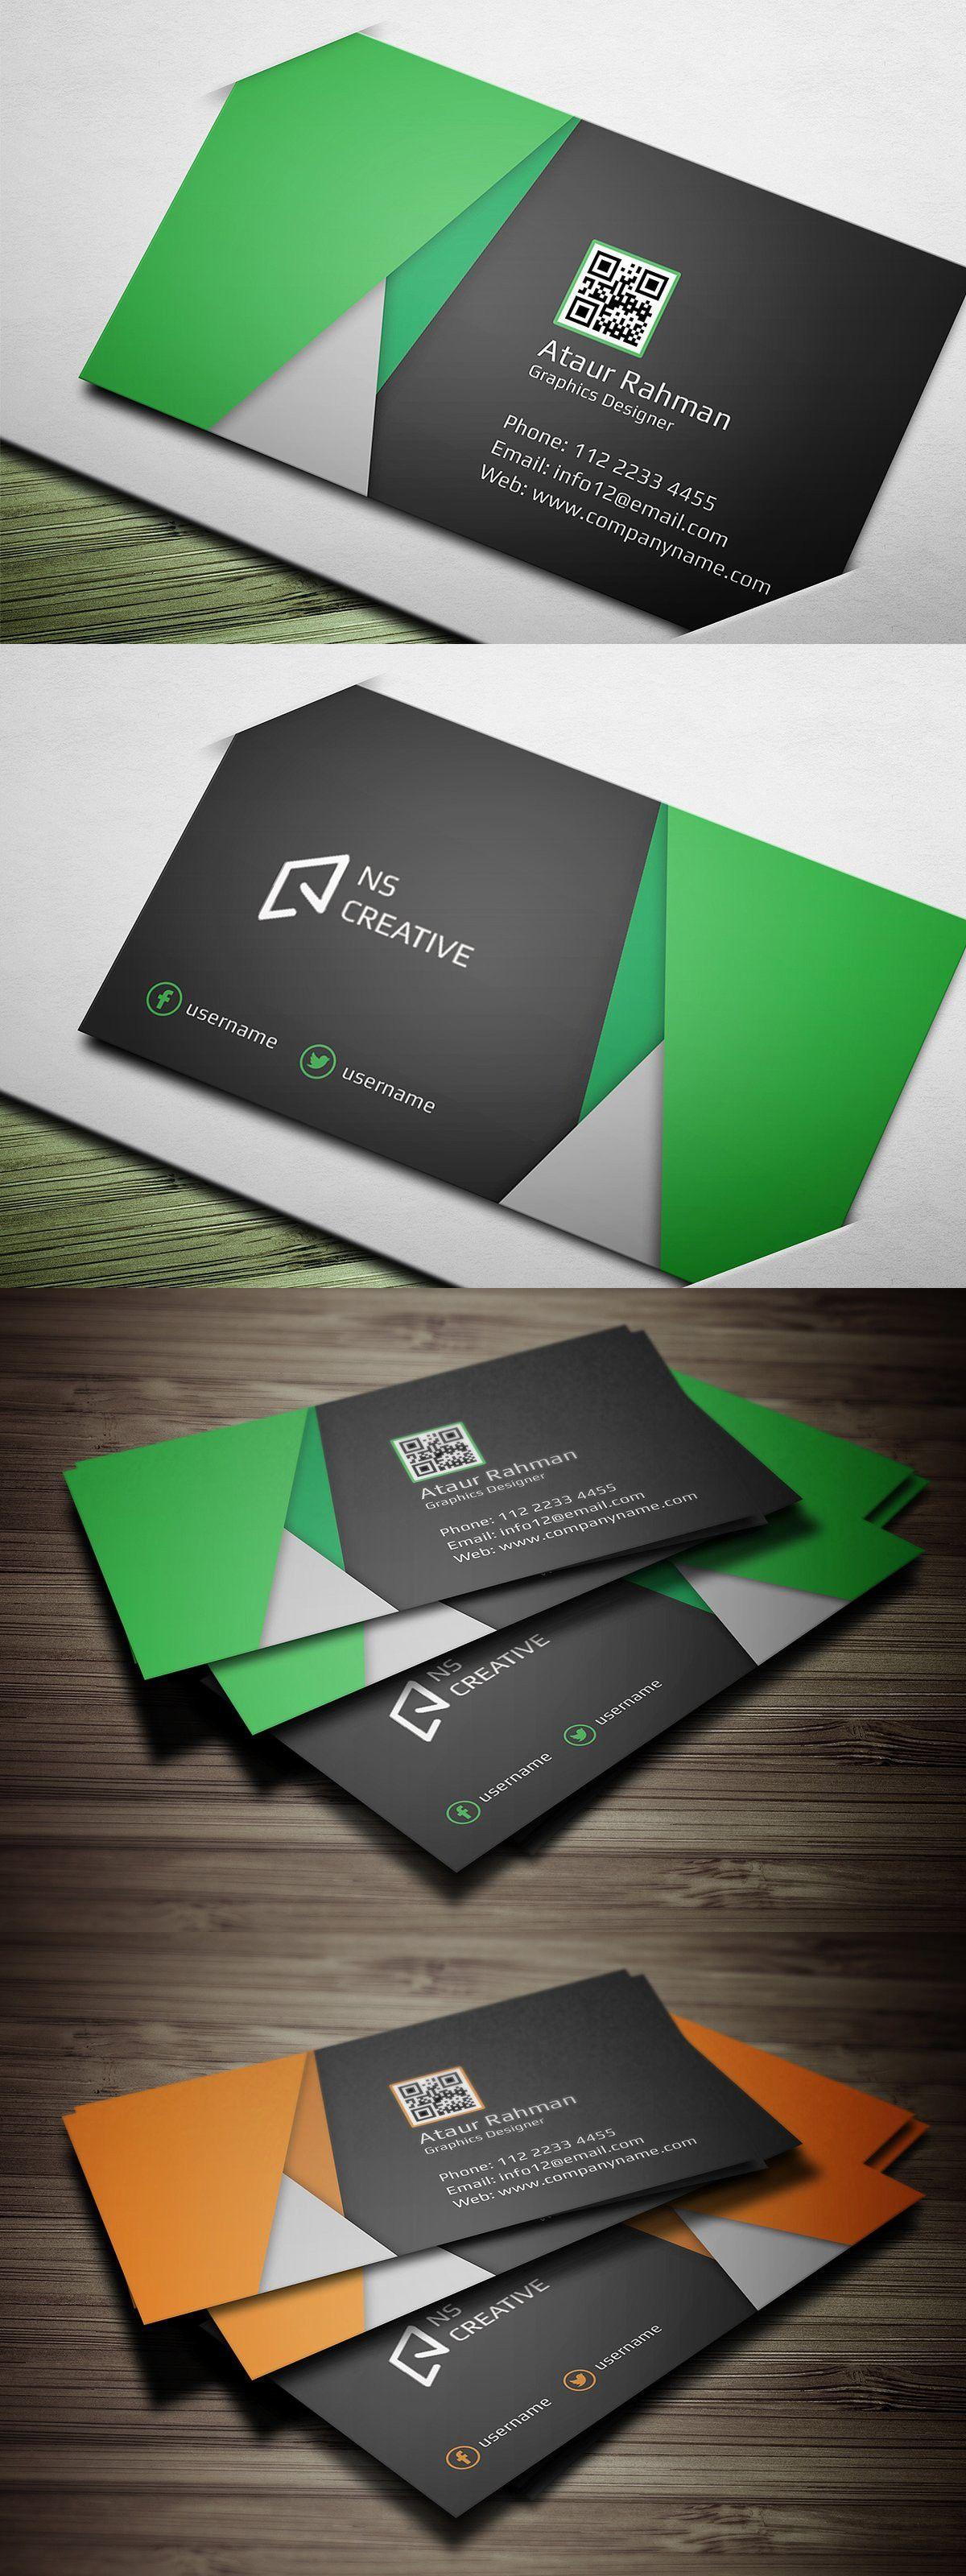 Creative Business Card Business Cards Creative Business Cards Elegant Business Cards